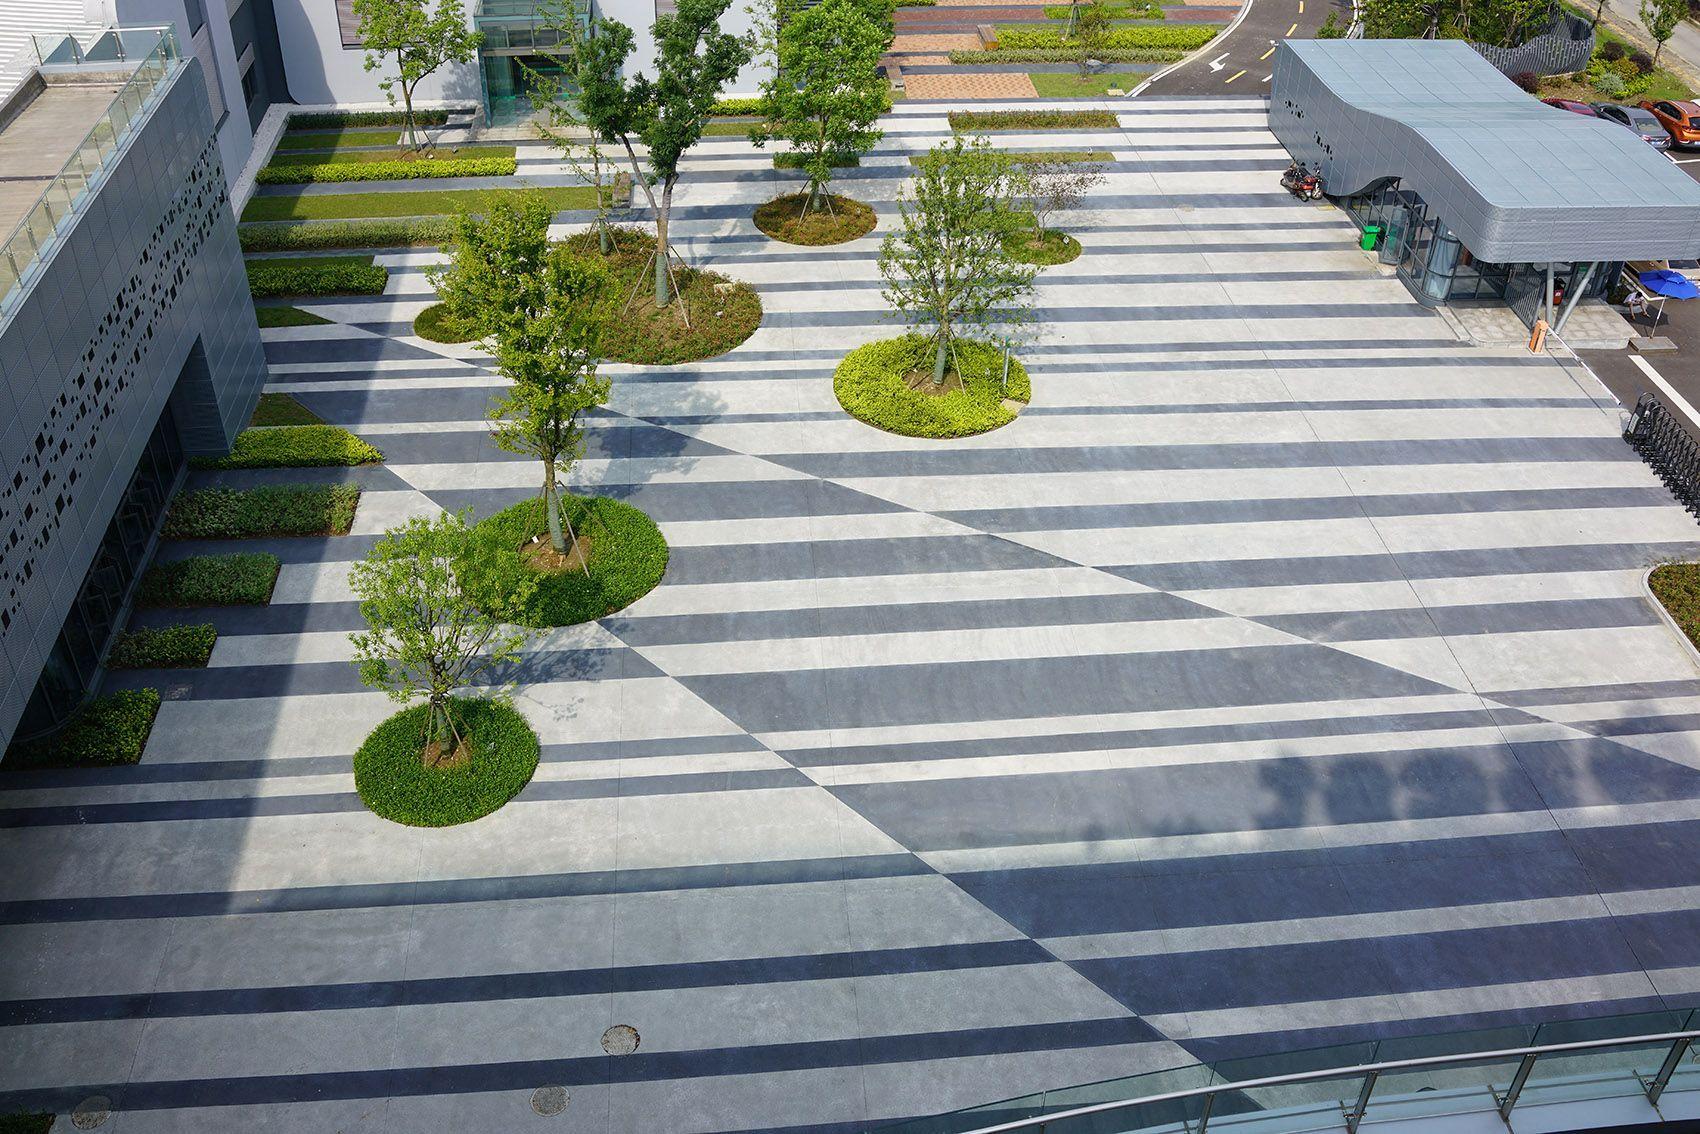 Landscapearchitectureplaza